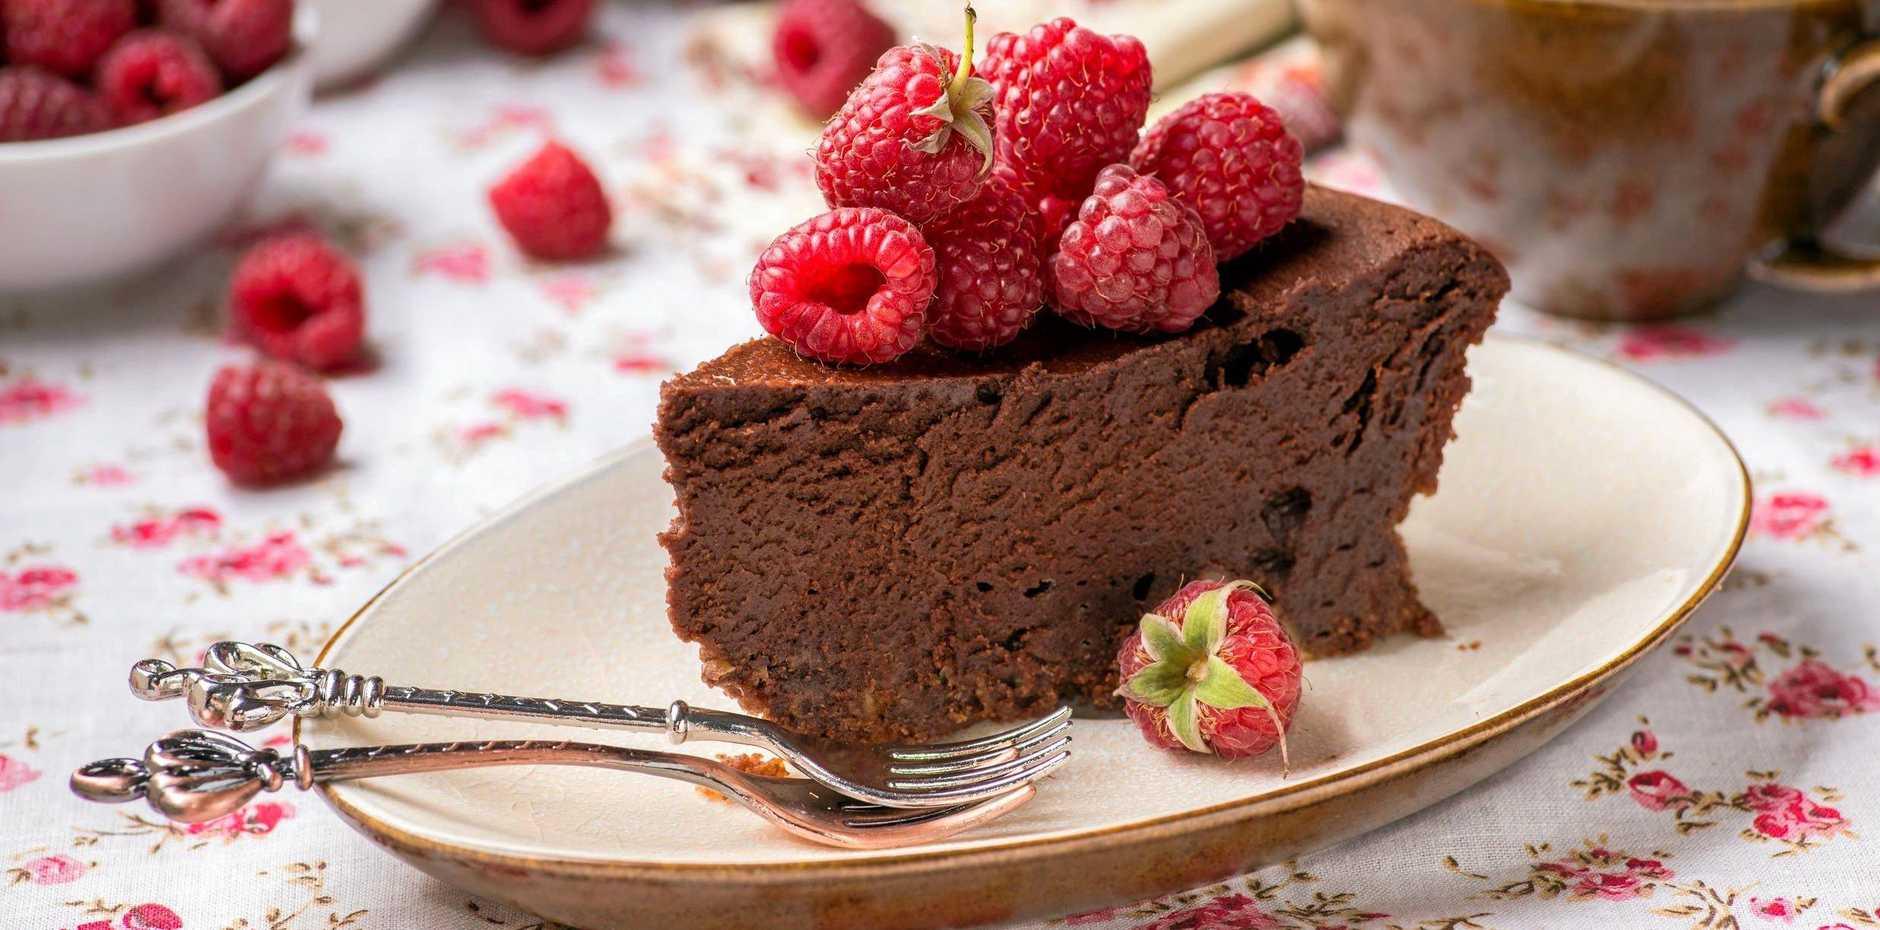 Maggie Cooper's truffle cake.